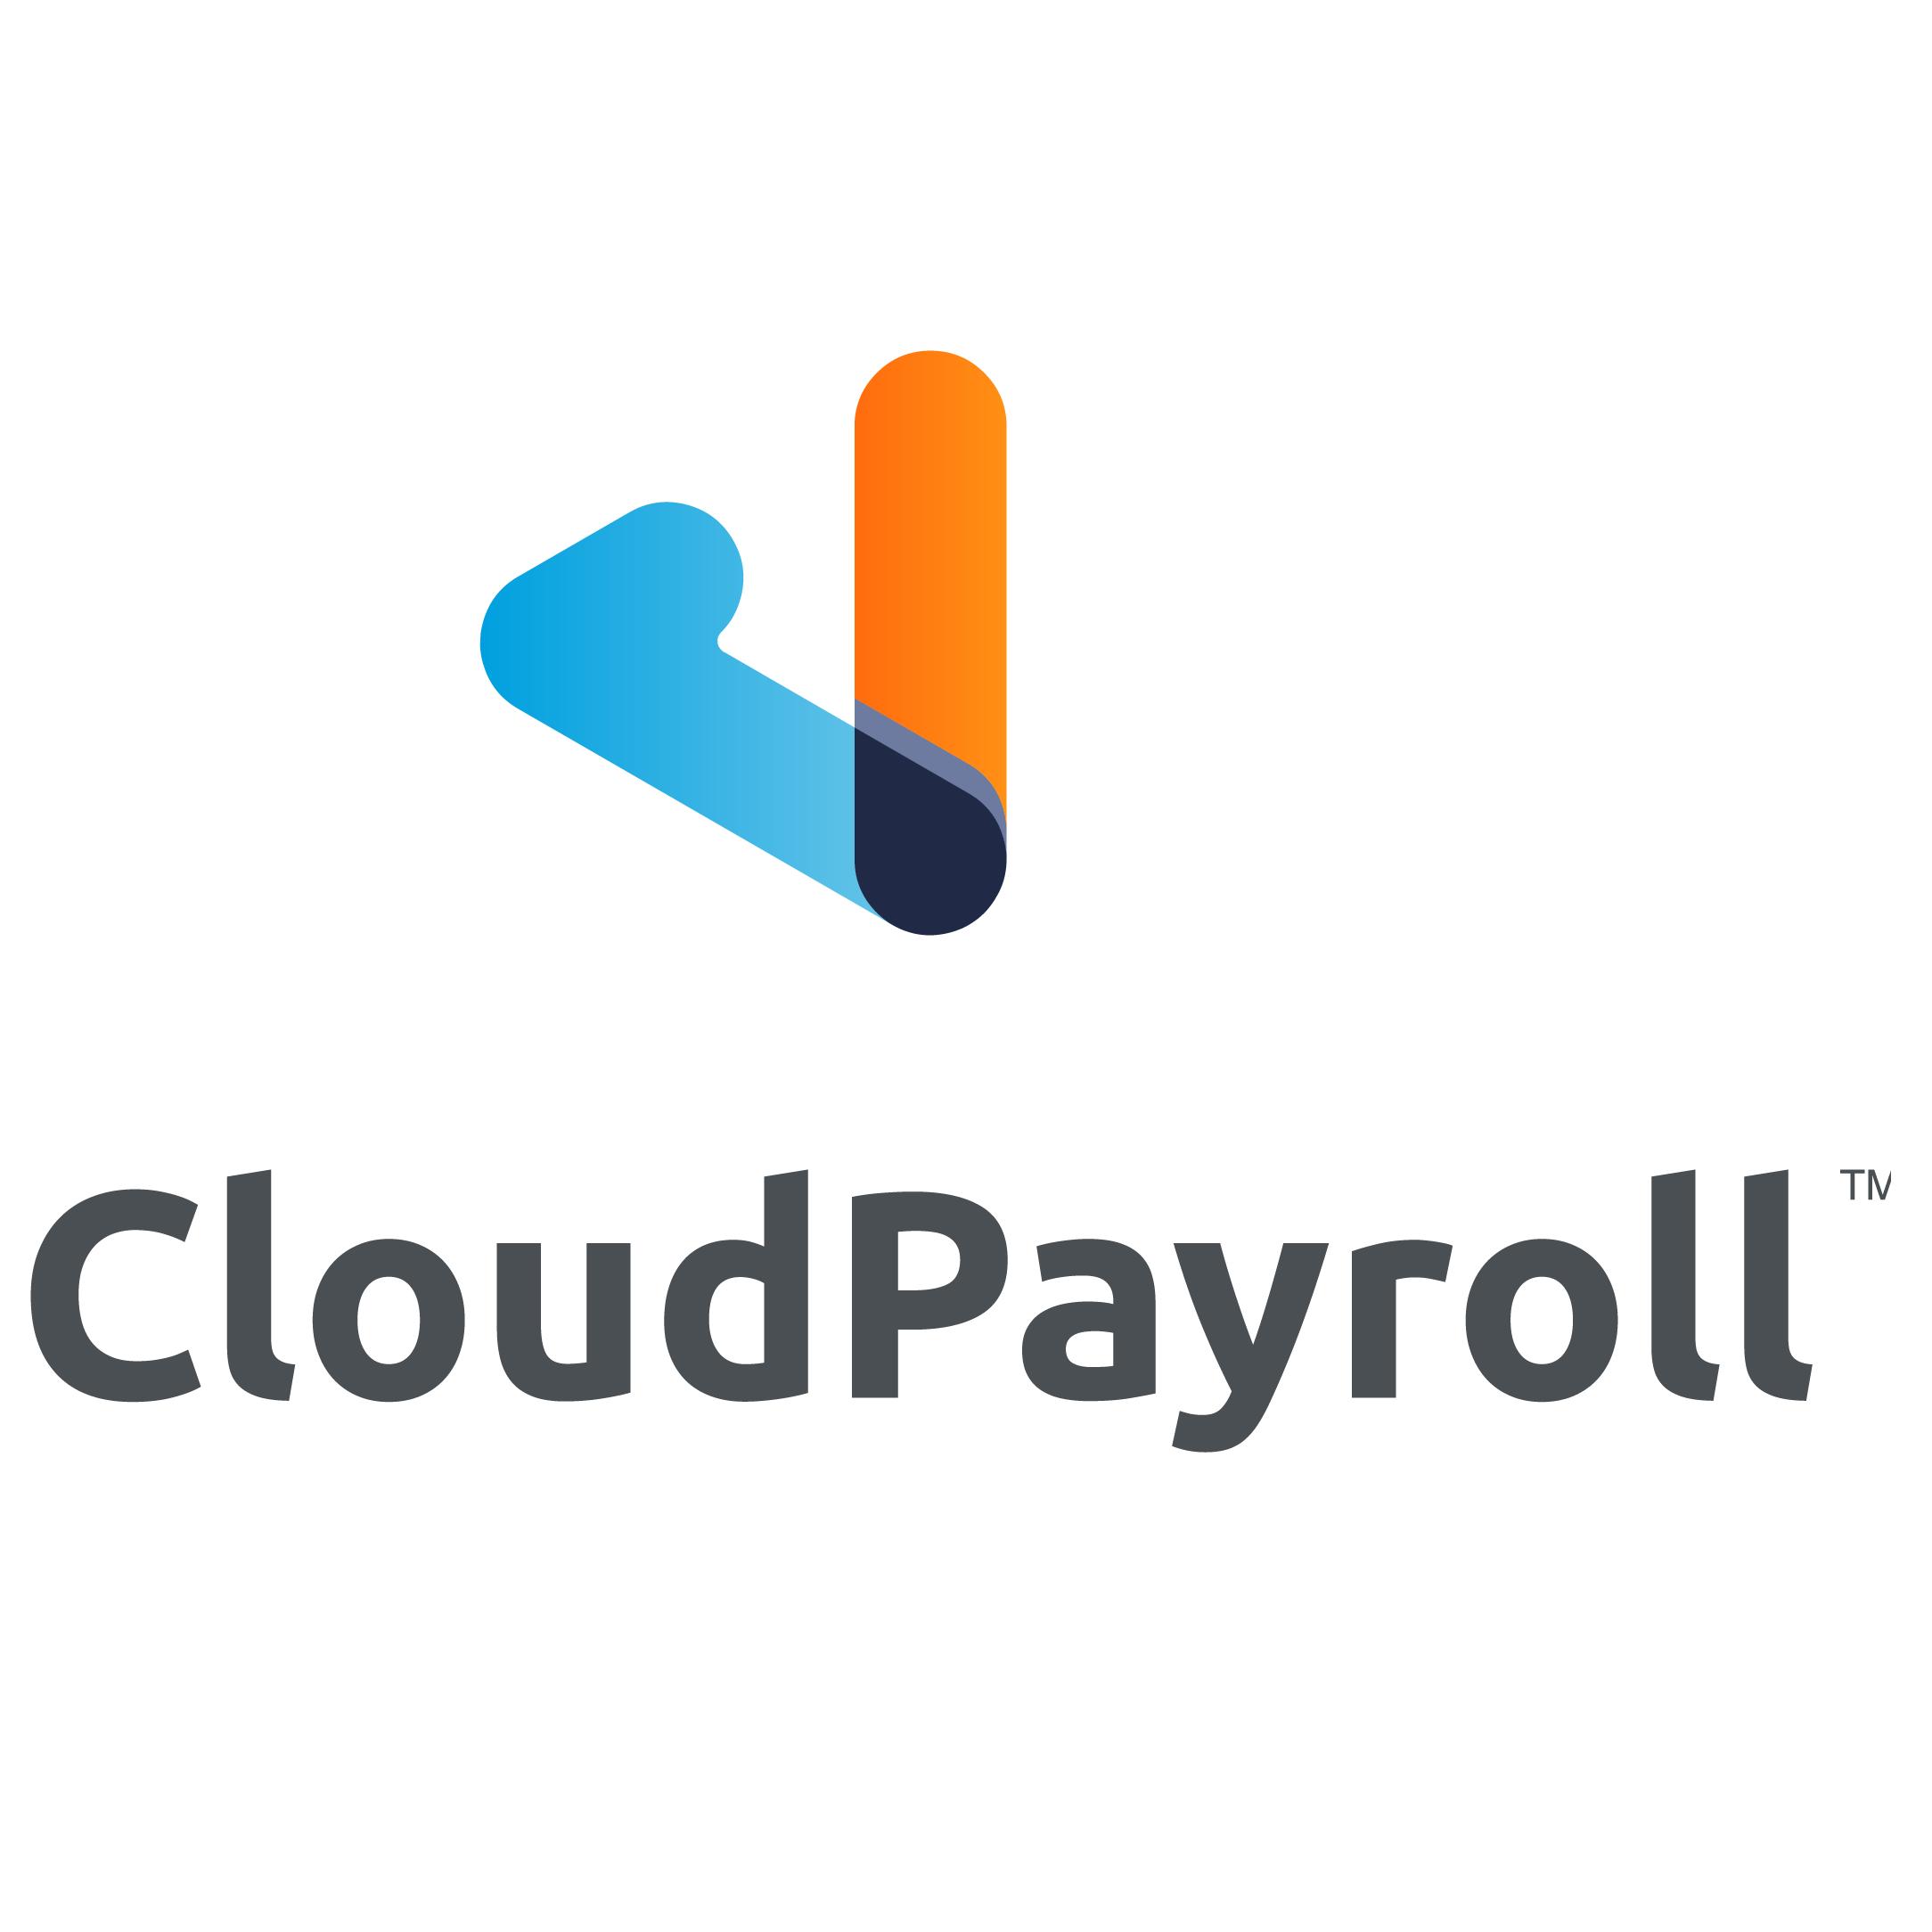 Cloudpayroll_vertical_RGB.png